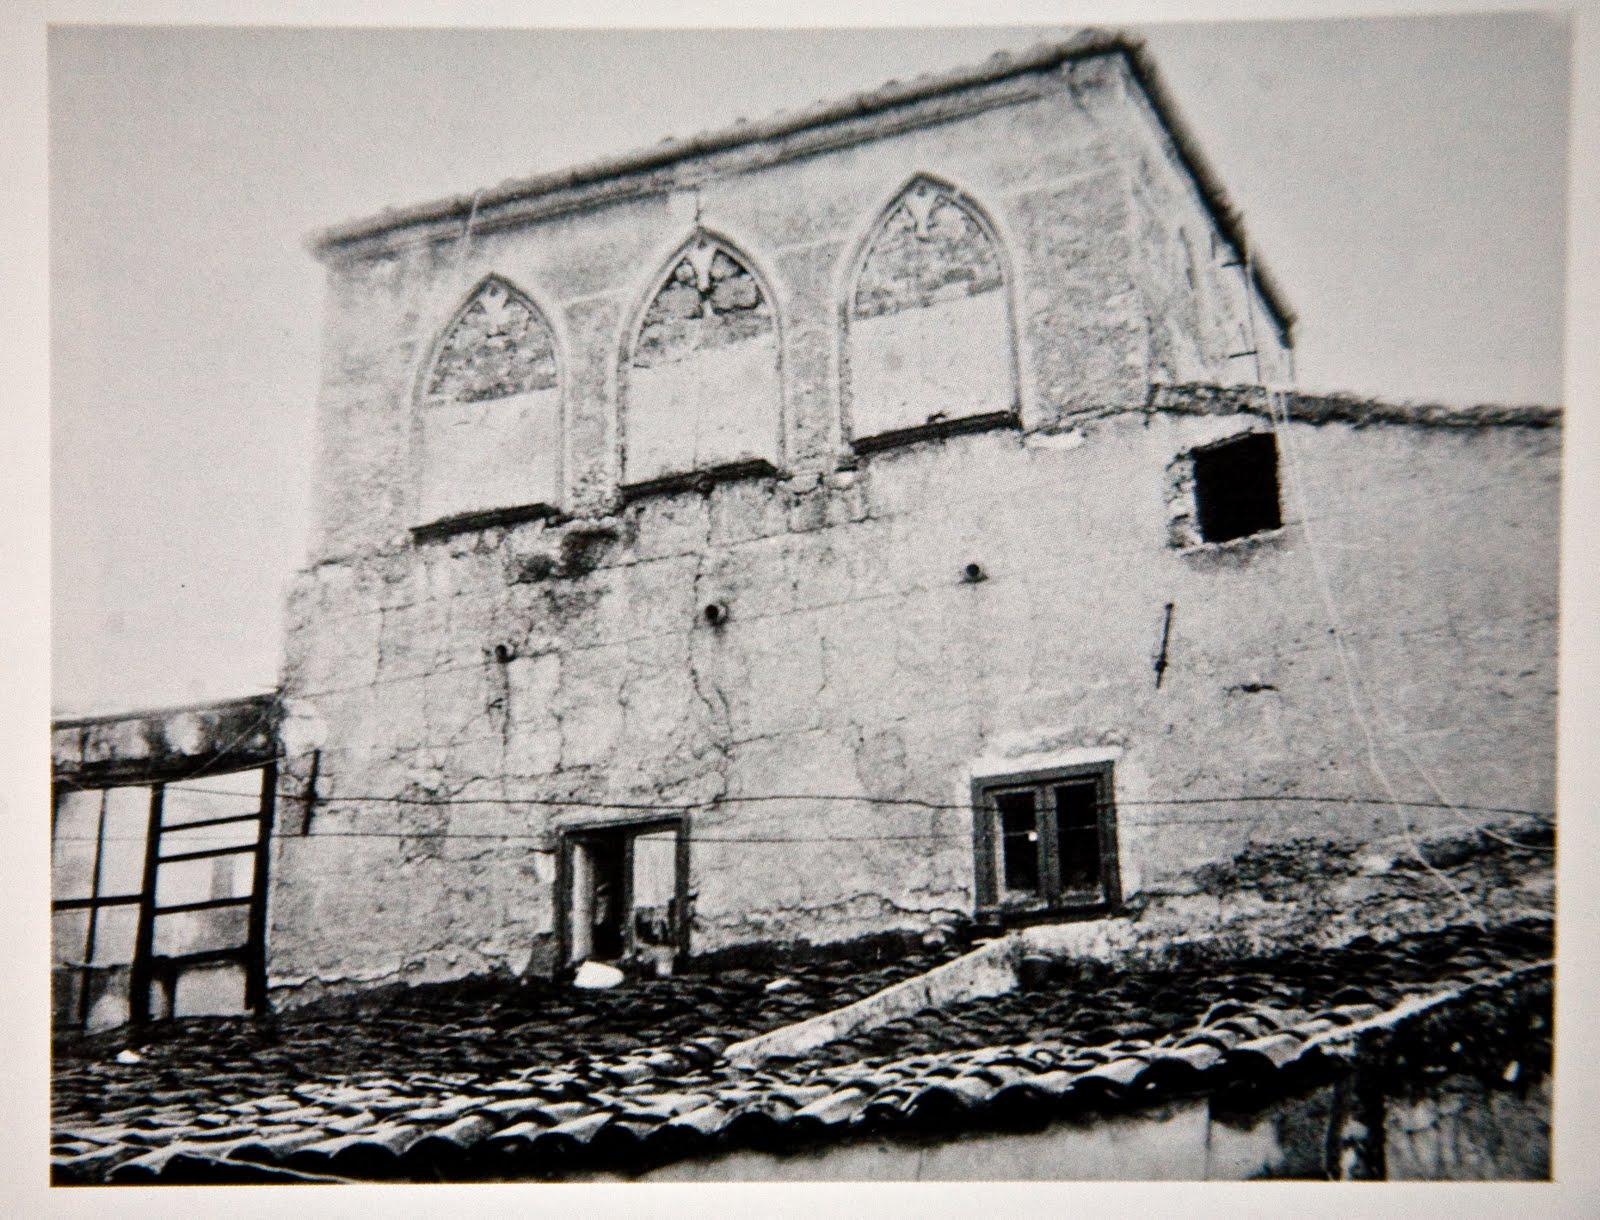 De urbe calatanixecta servanda est 3 parte for Antica finestra a tre aperture